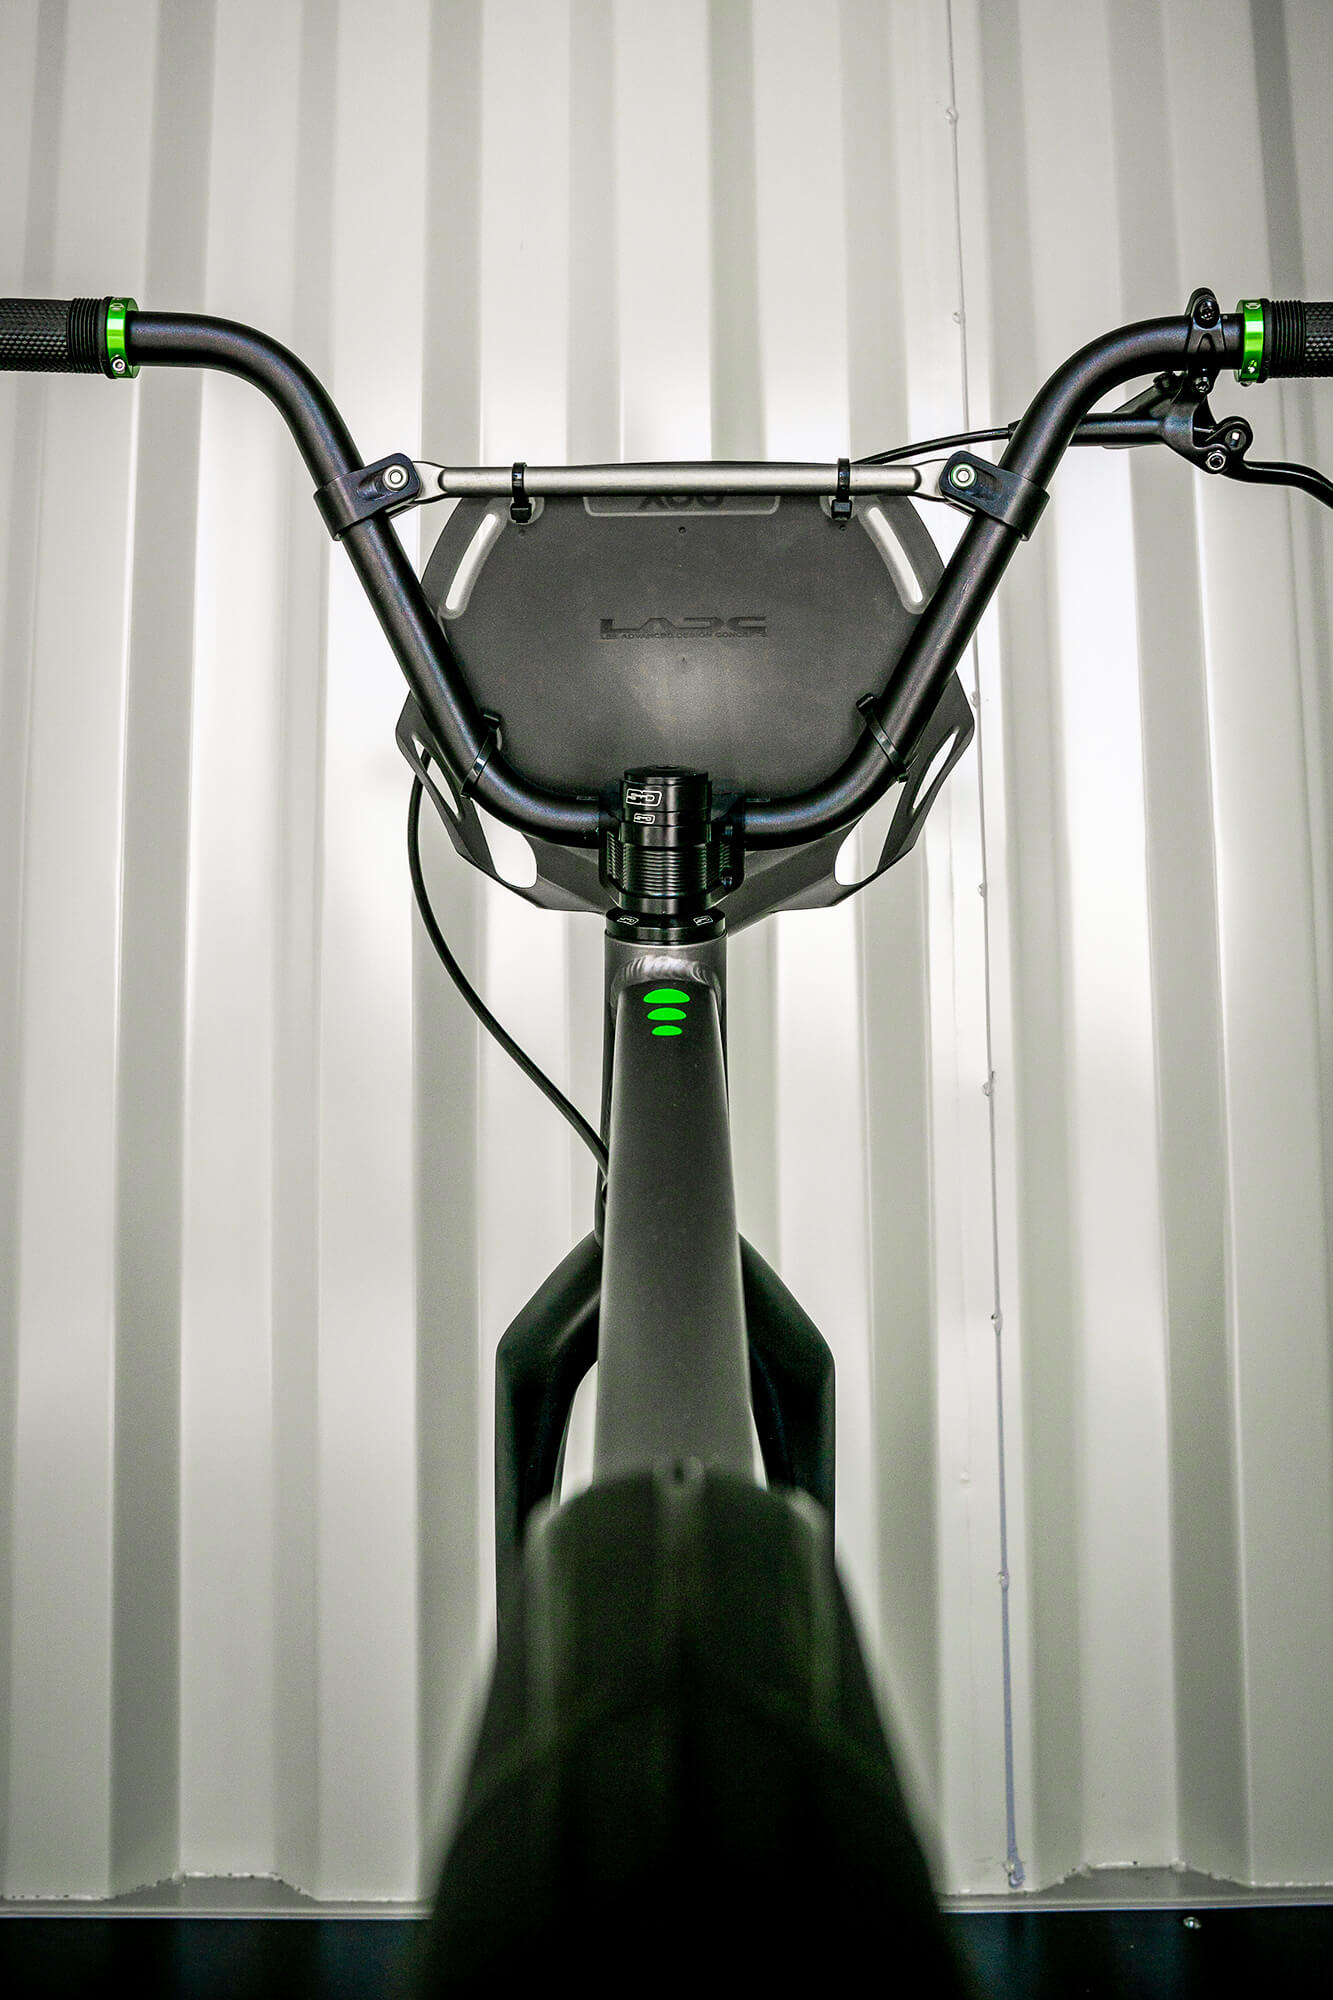 Team Oegema TVE Bike Check 2020 - DSC02203 - Niel Bensink